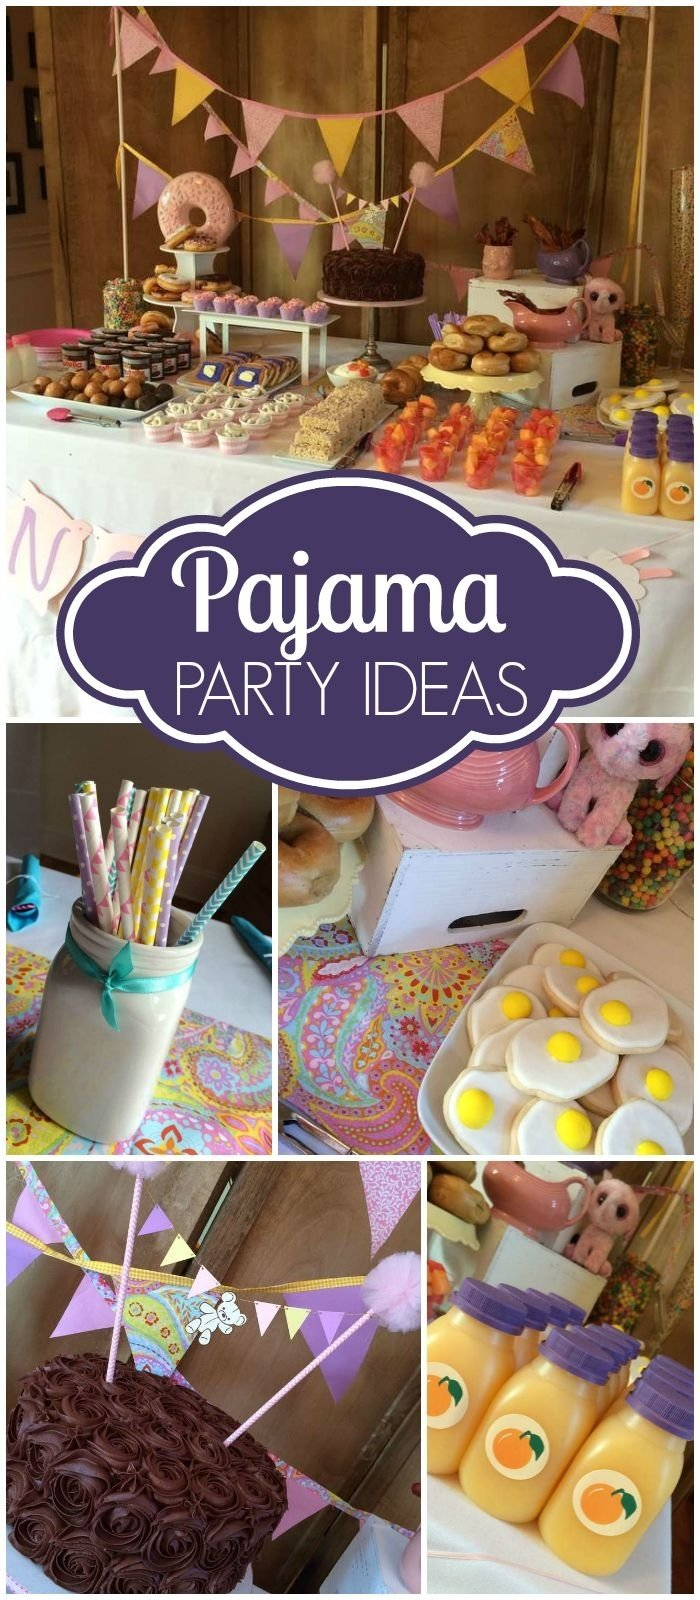 10 Most Popular Slumber Party Ideas For Tweens pajama party birthday pretty pj party pyjamas animal and